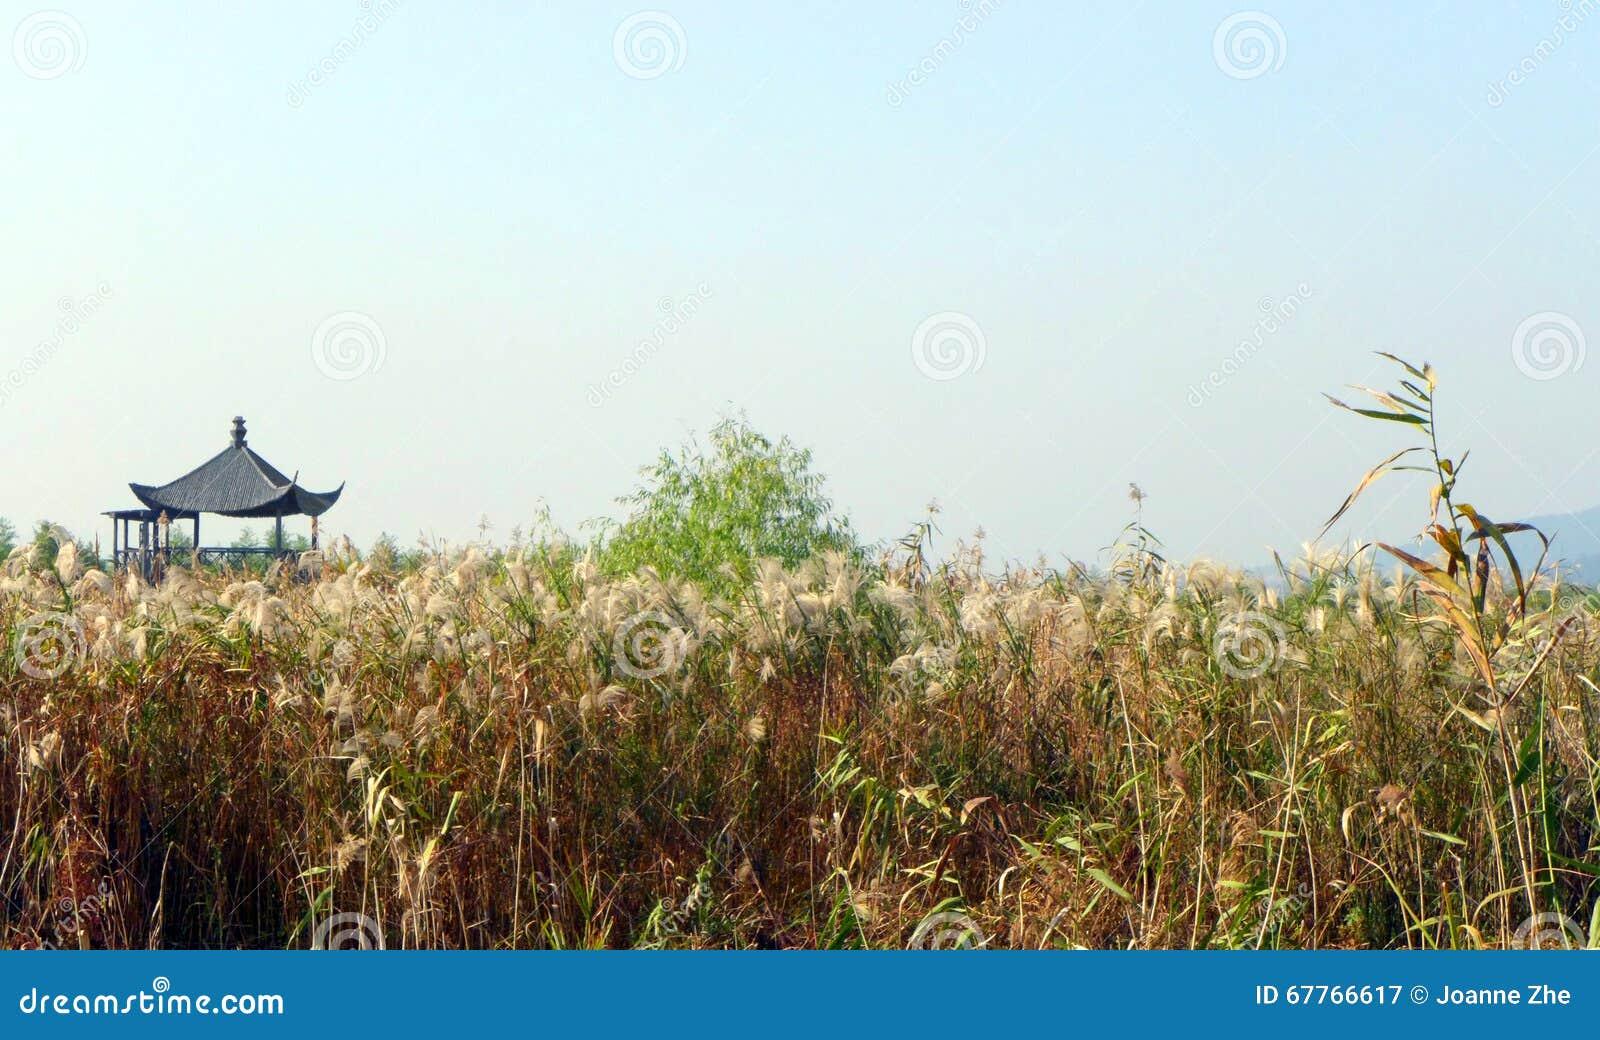 Scenic China wetland marshes nature park